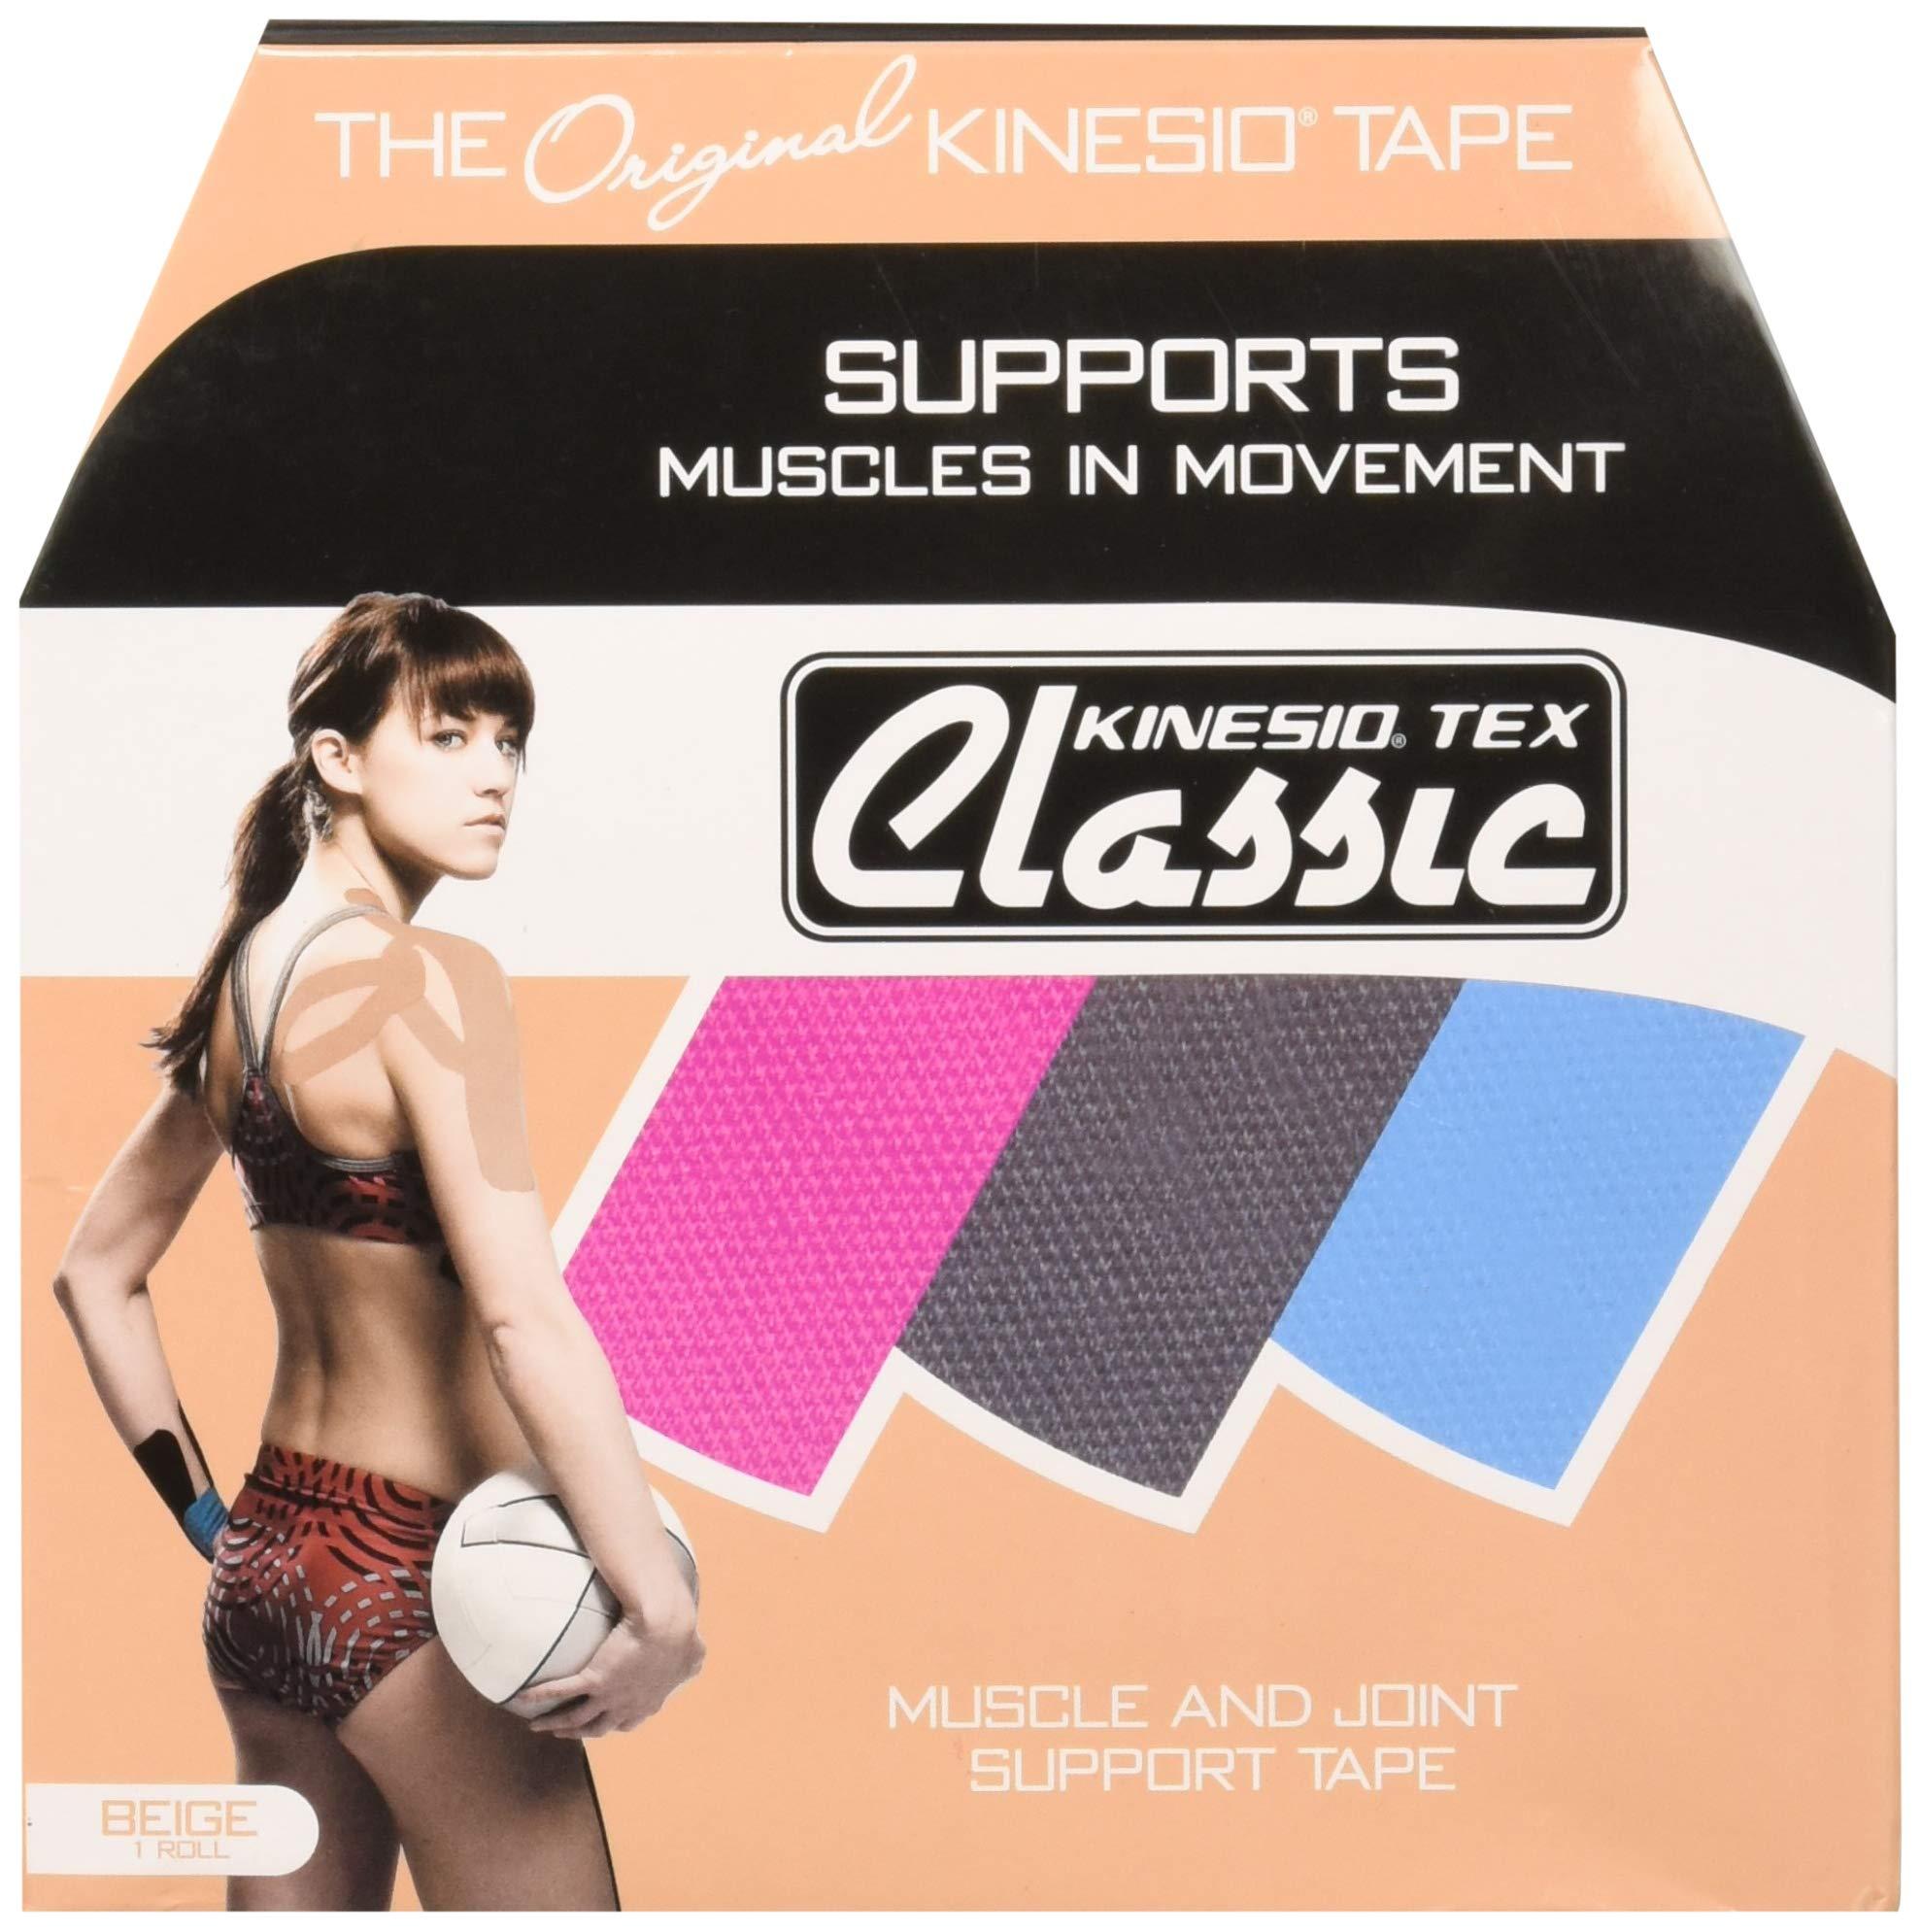 Kinesio Tex Classic Tape 2'' x 33.5 yd (103')-Beige by Kinesio